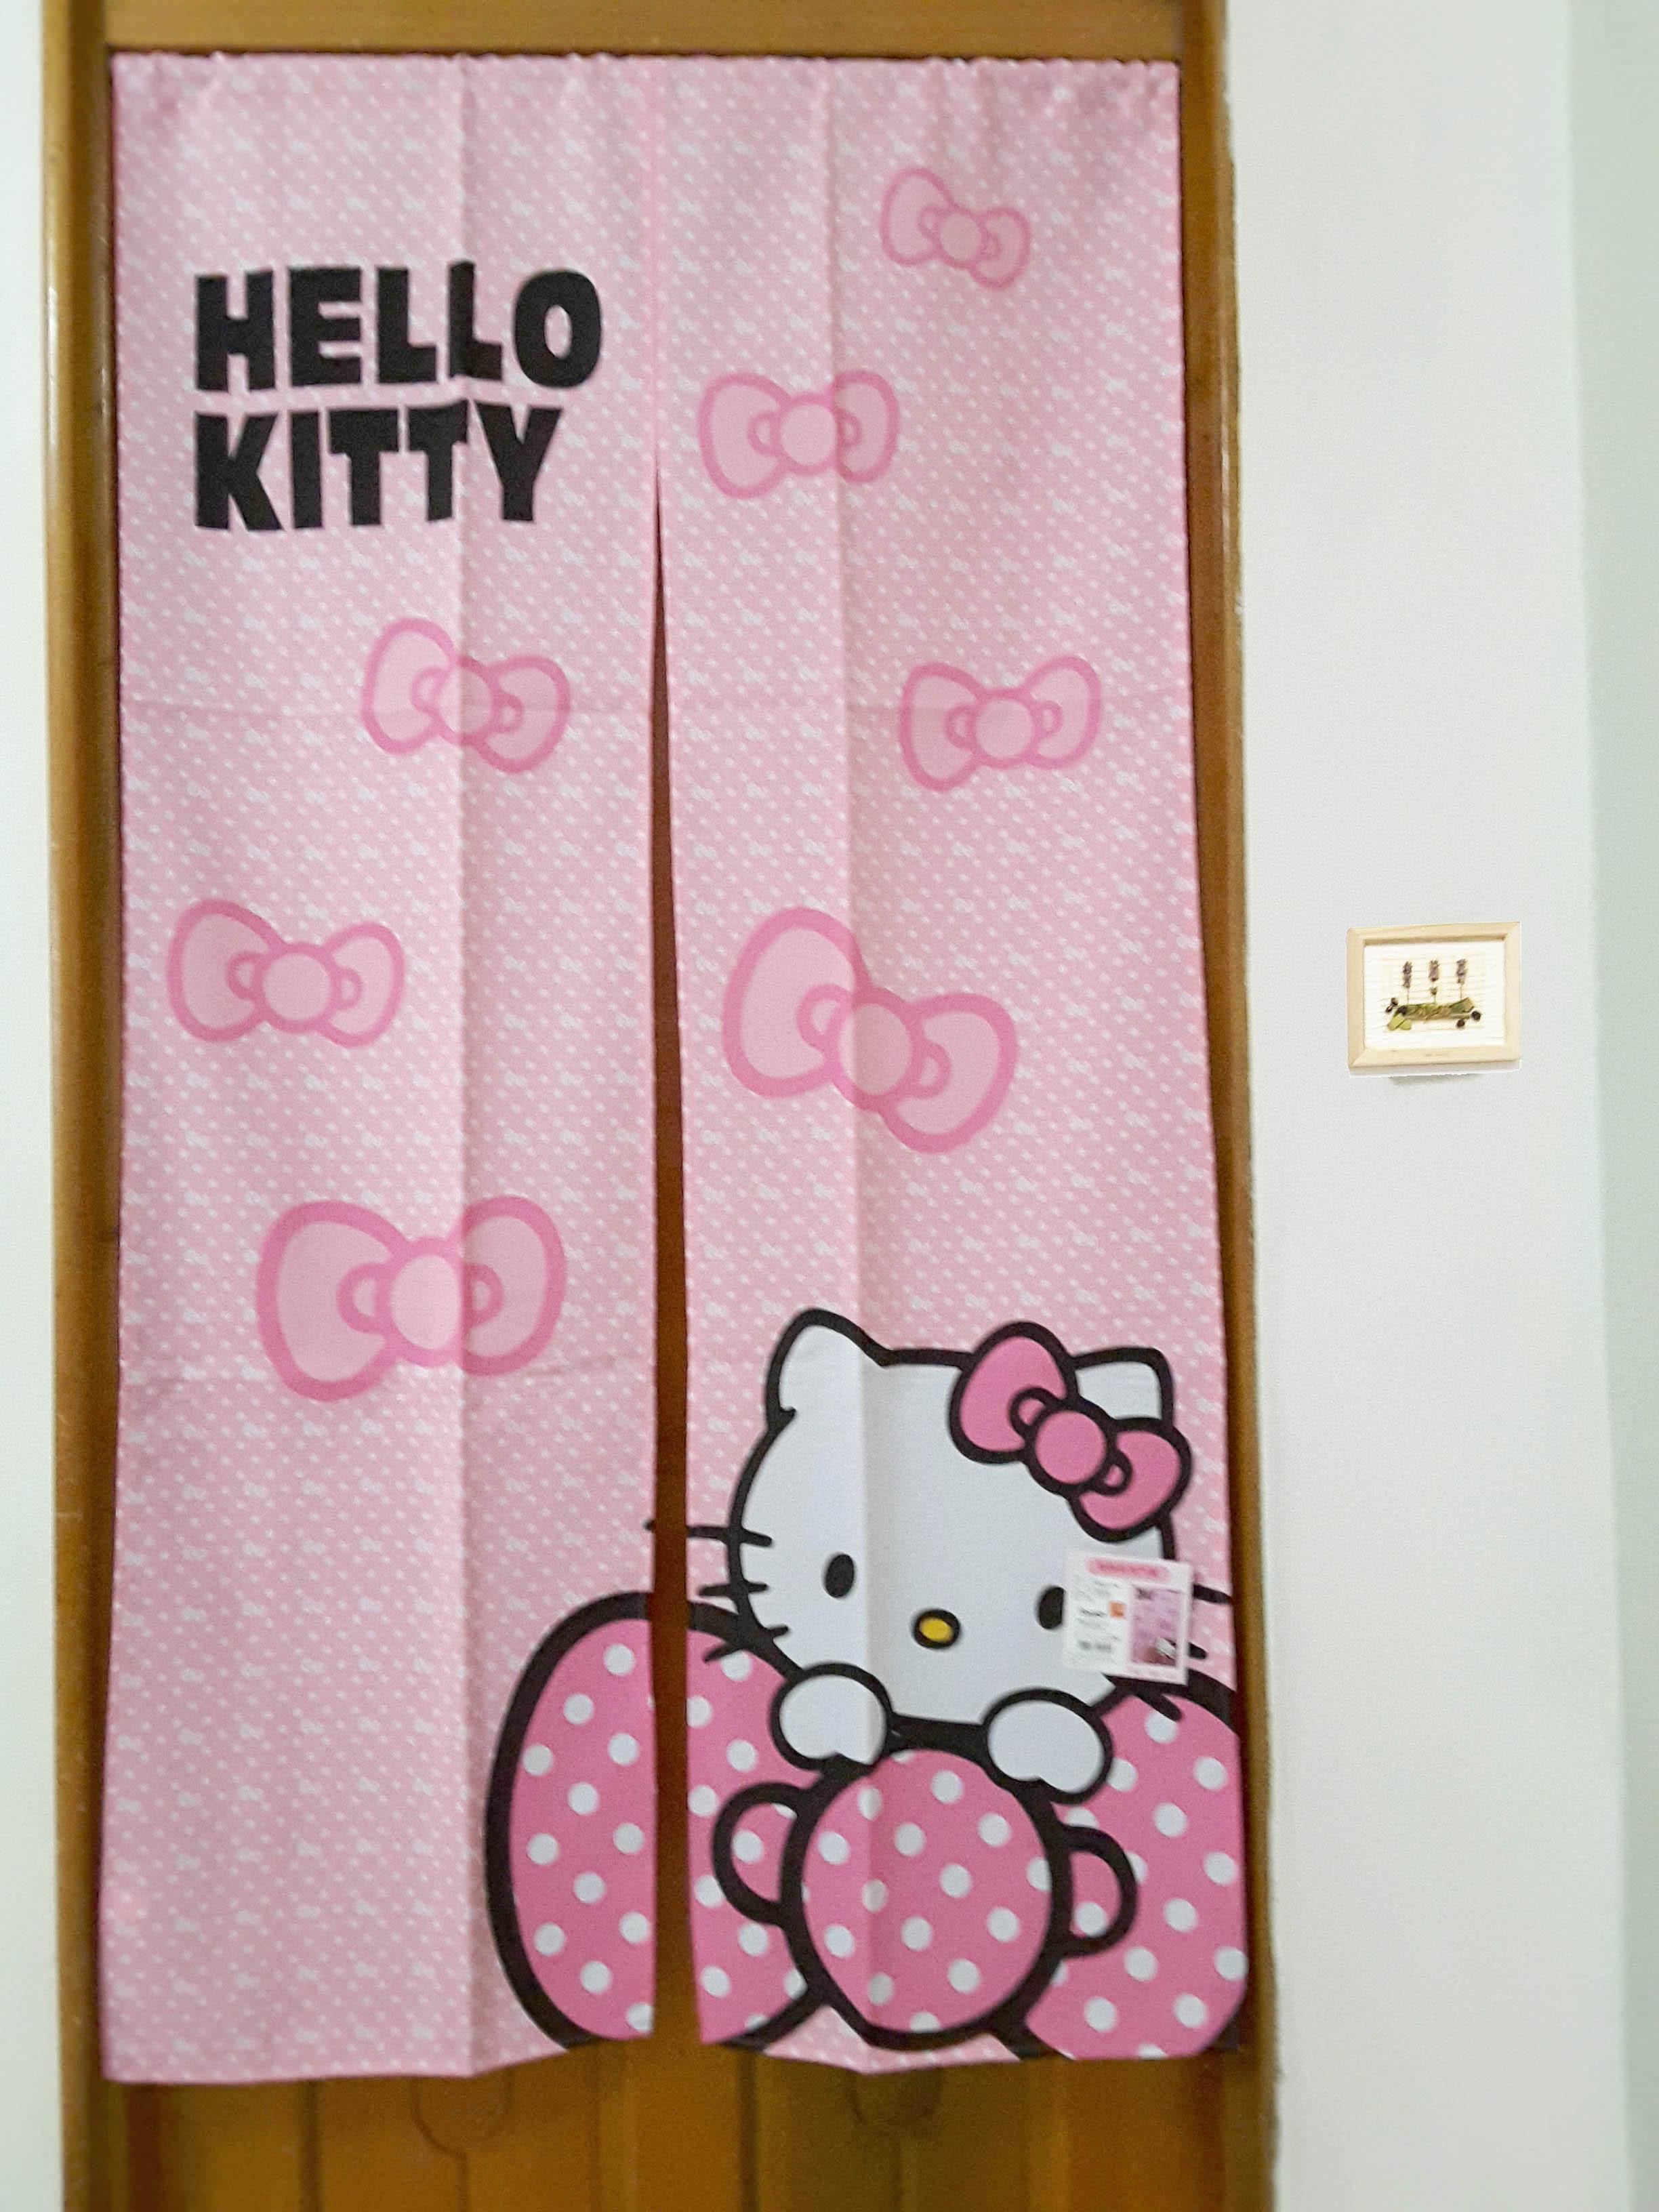 La maison生活小舖《HELLO KITTY兩片式門簾》色彩繽紛可愛 美化居家環境 隔間遮光風水適用